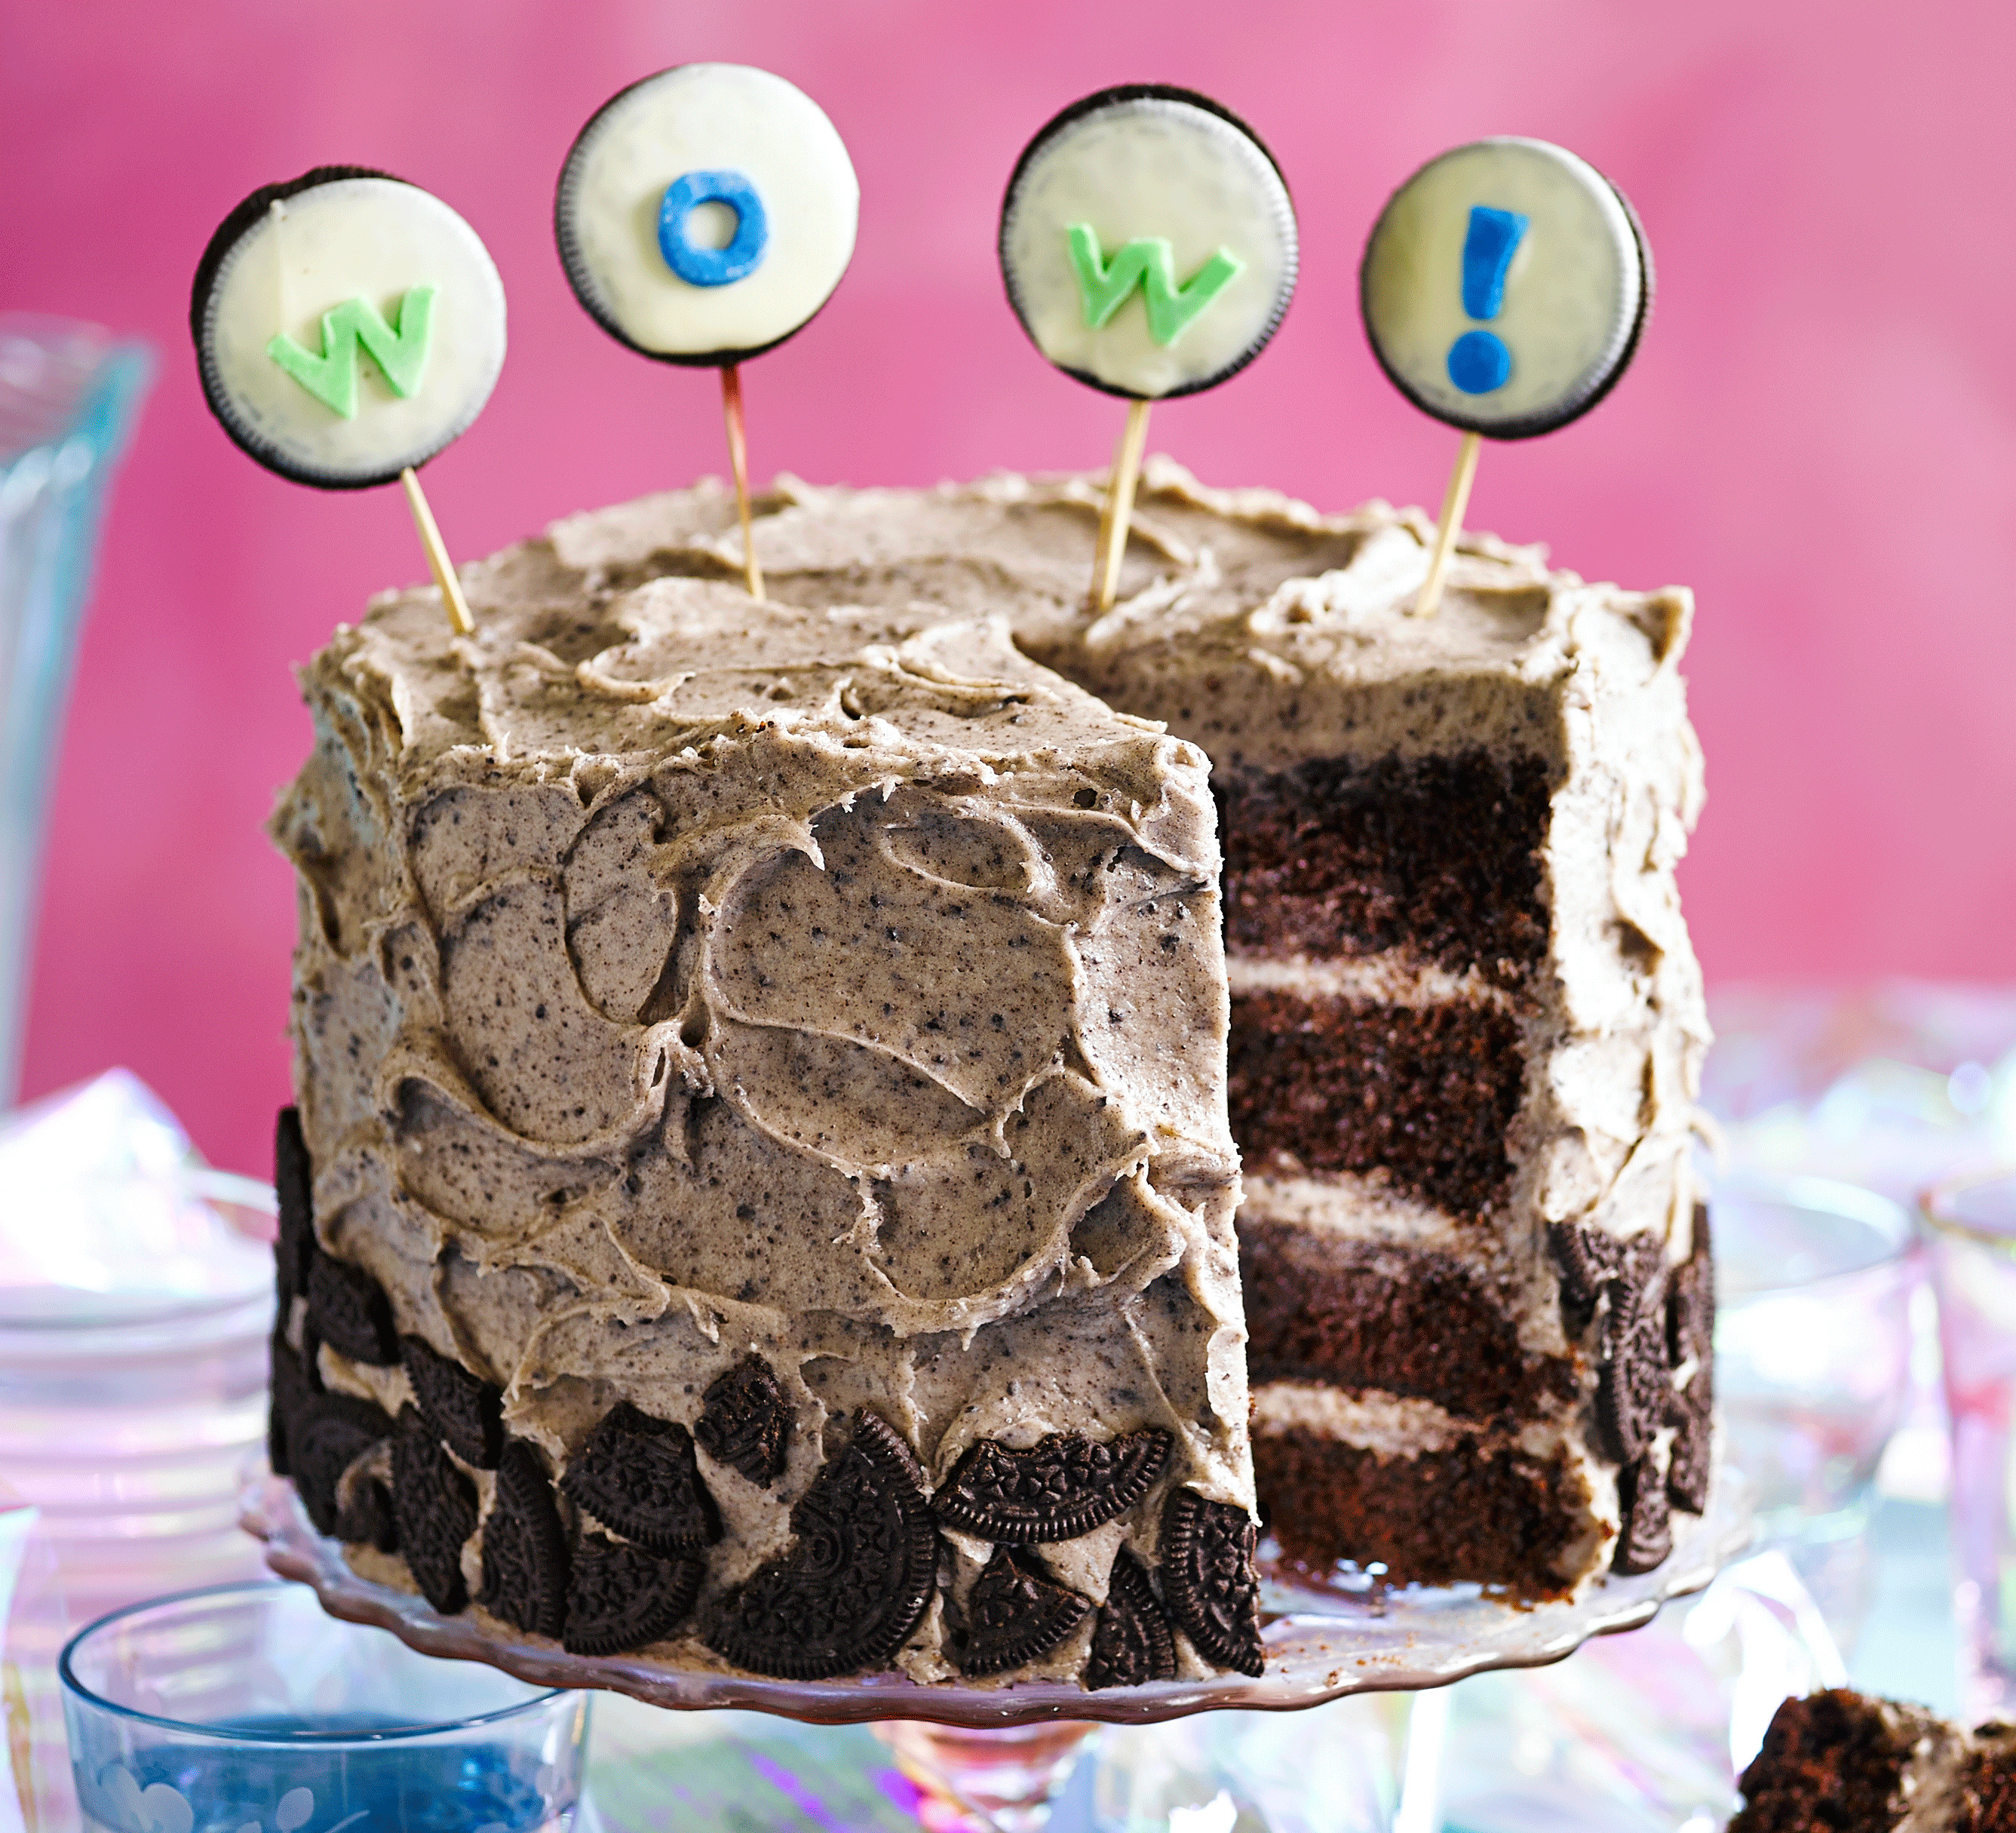 Cake Recipe Ideas  Cookies & cream party cake